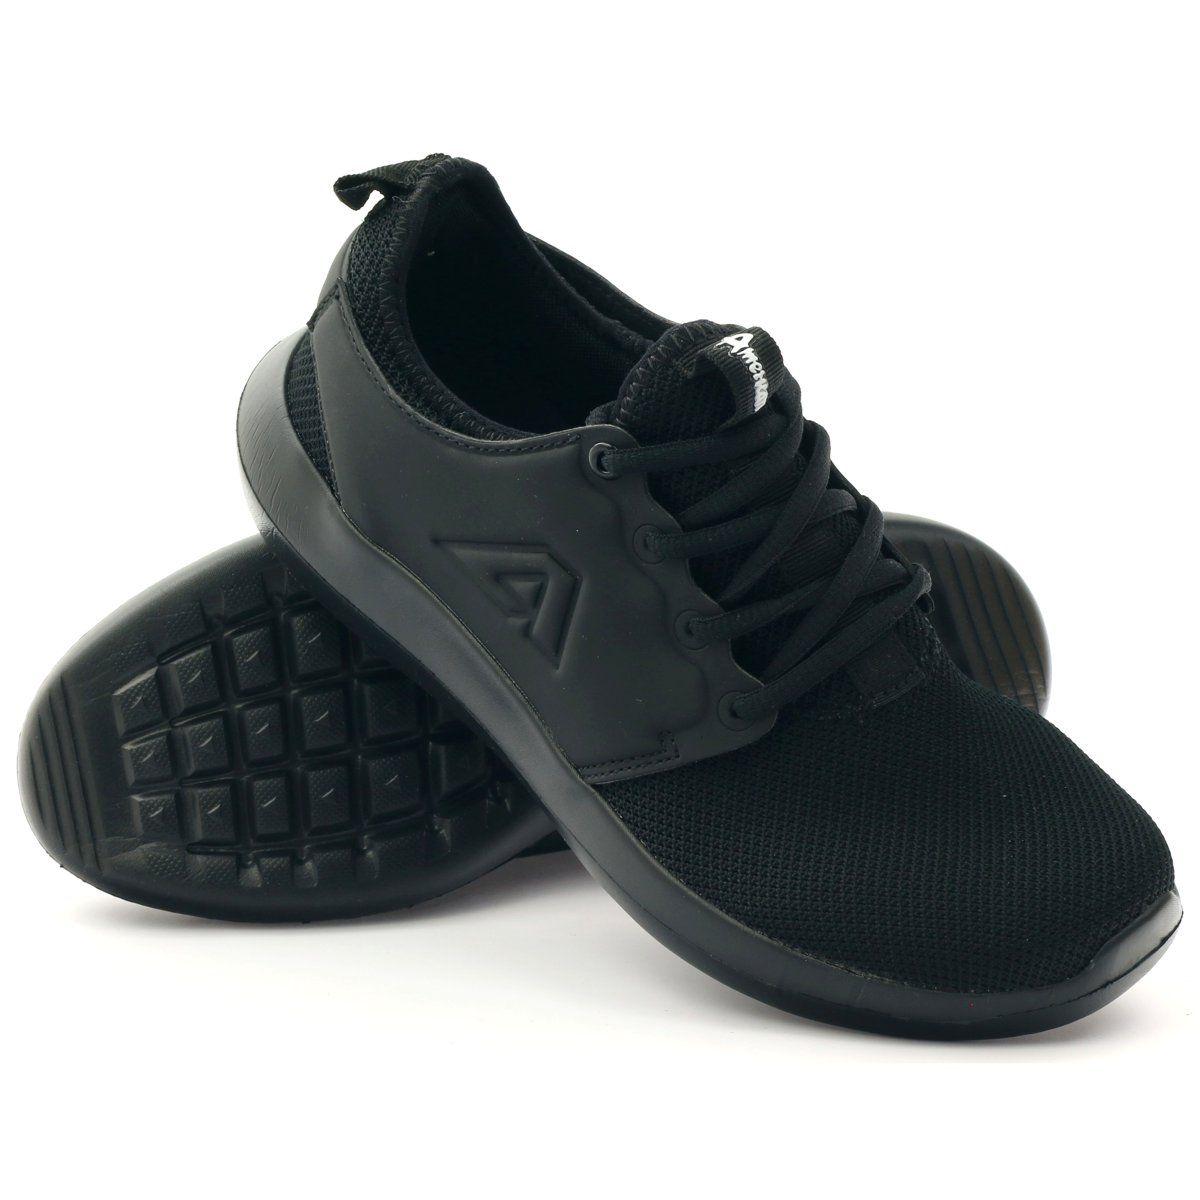 American Club Sportowe Joggingowe American 1772 Czarne Baby Shoes Shoes American